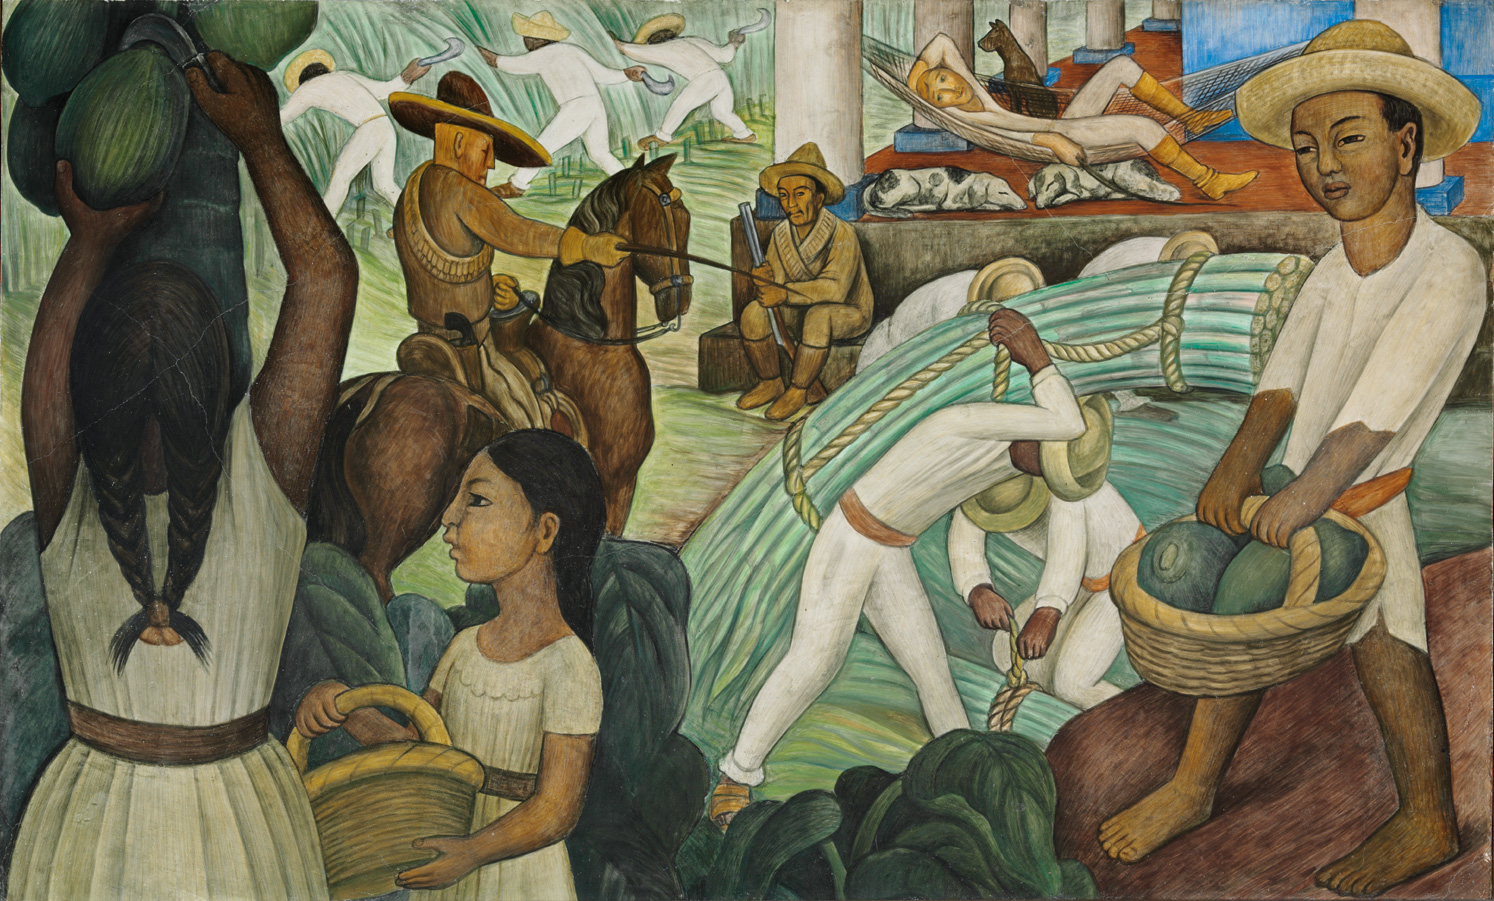 - Diego Rivera (1886-1957). Sugar Cane, 1931, mural